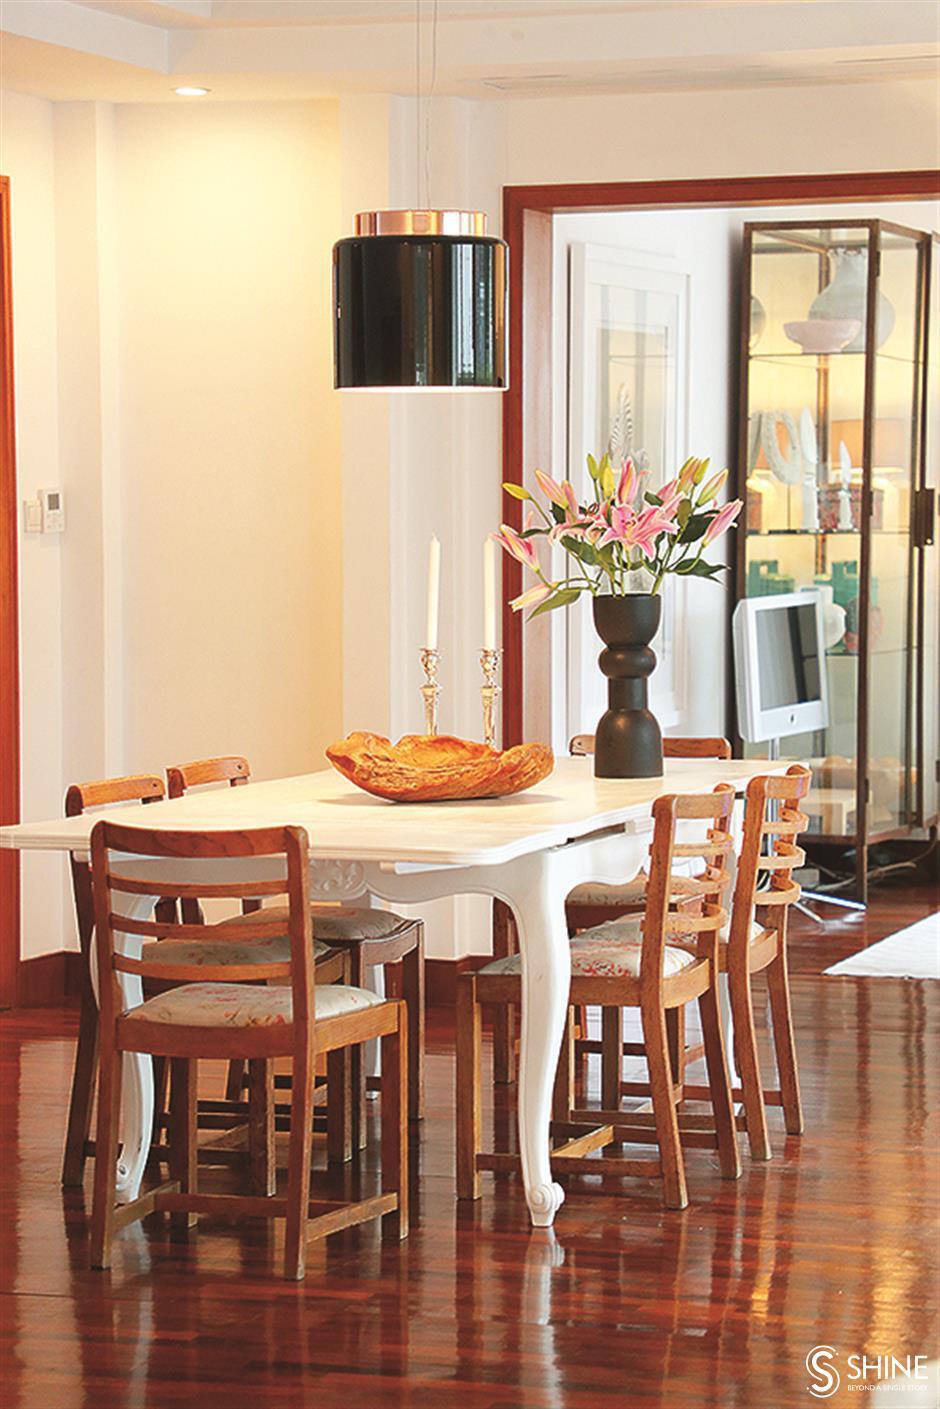 Calm, comforting, family sanctuary allows artistic creativity to blossom